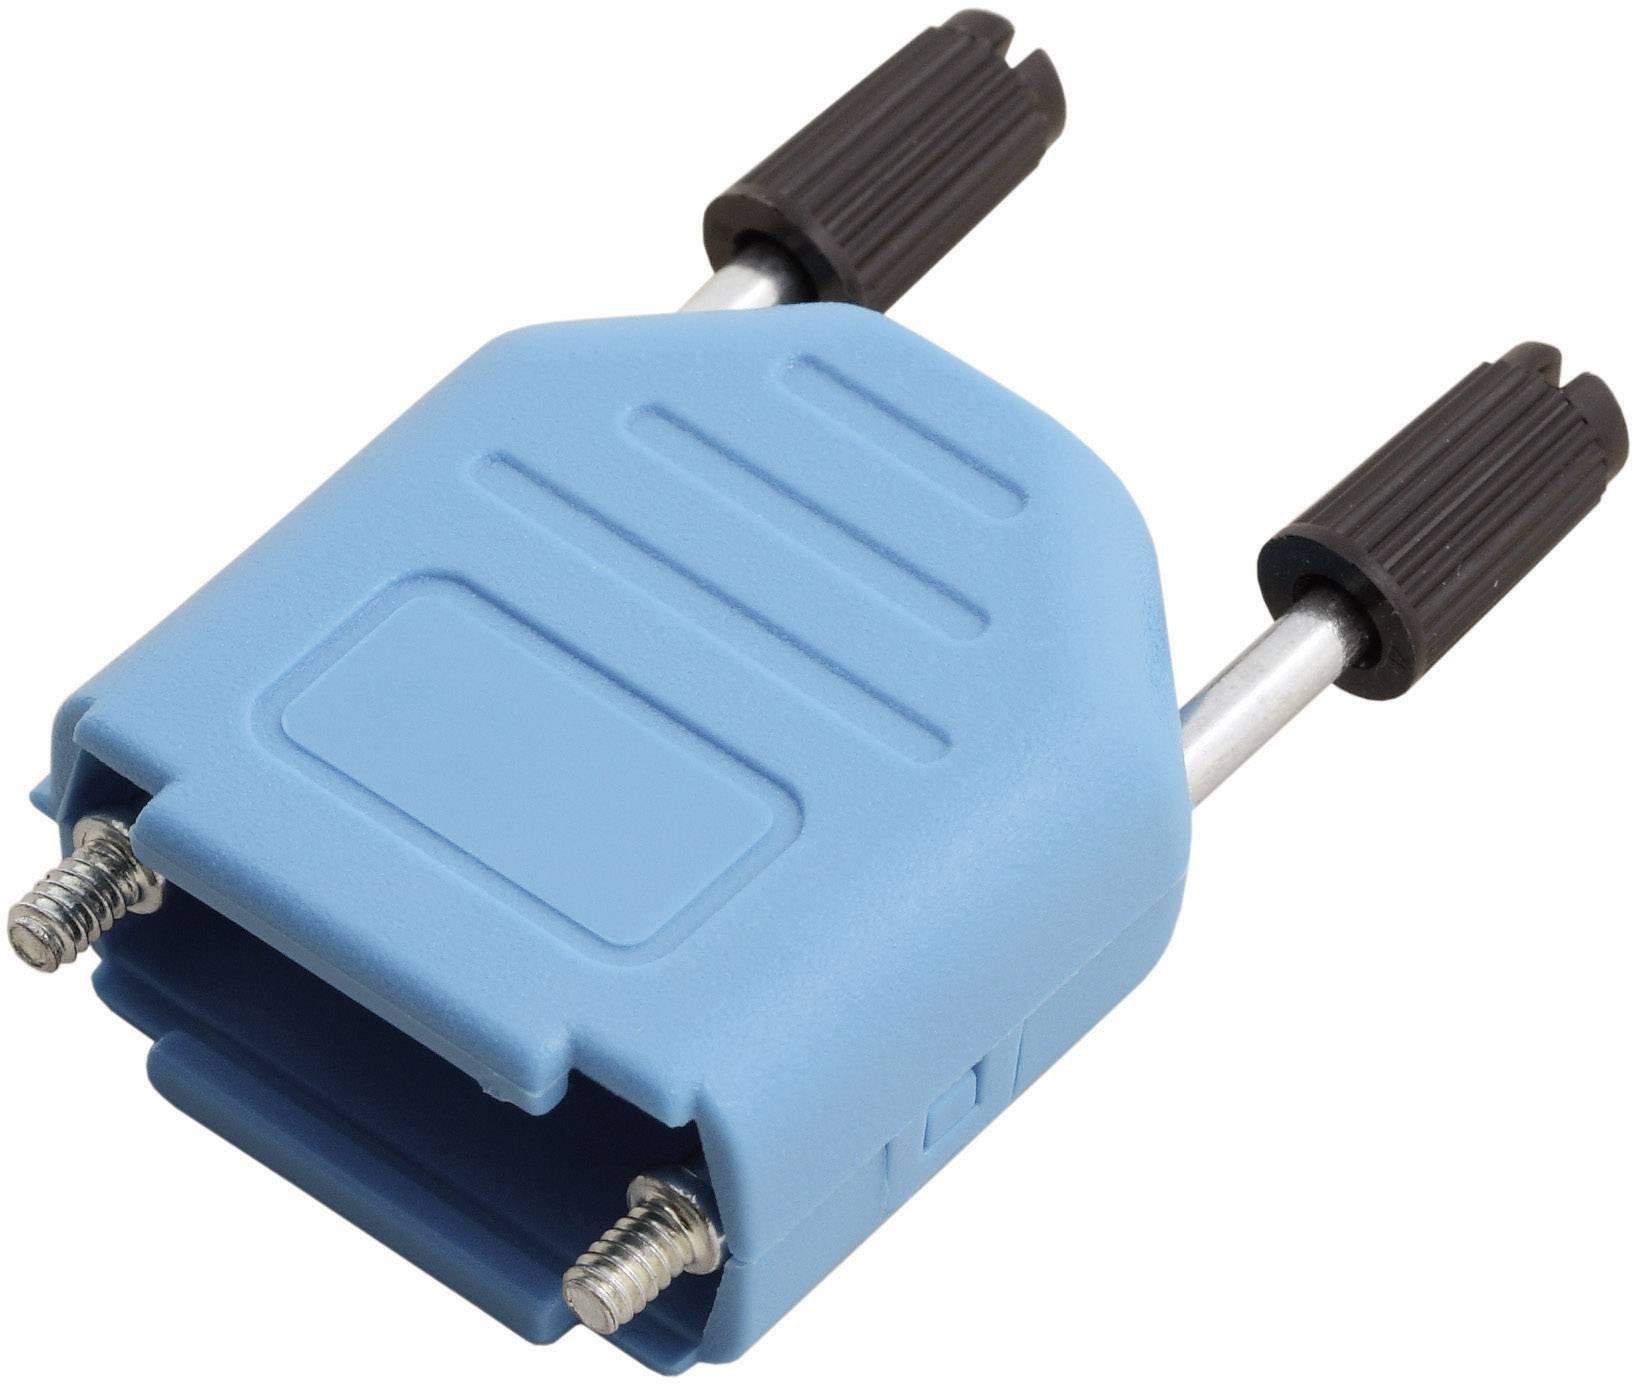 D-SUB pouzdro MH Connectors MHDPPK37-B-K, Pólů: 37, plast, 180 °, modrá, 1 ks